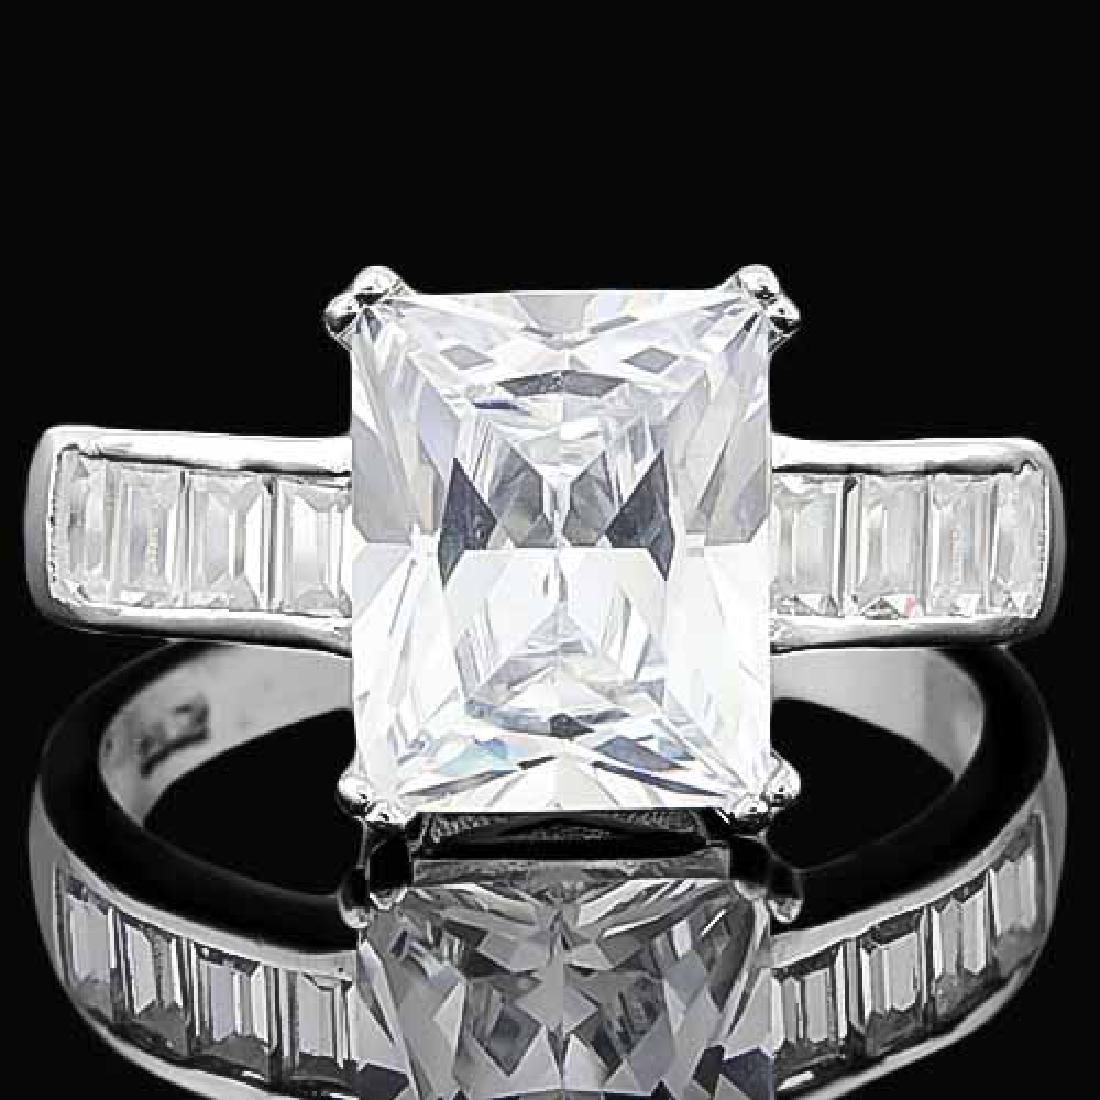 4 2/5 CARAT (13 PCS) FLAWLESS CREATED DIAMOND 925 STERL